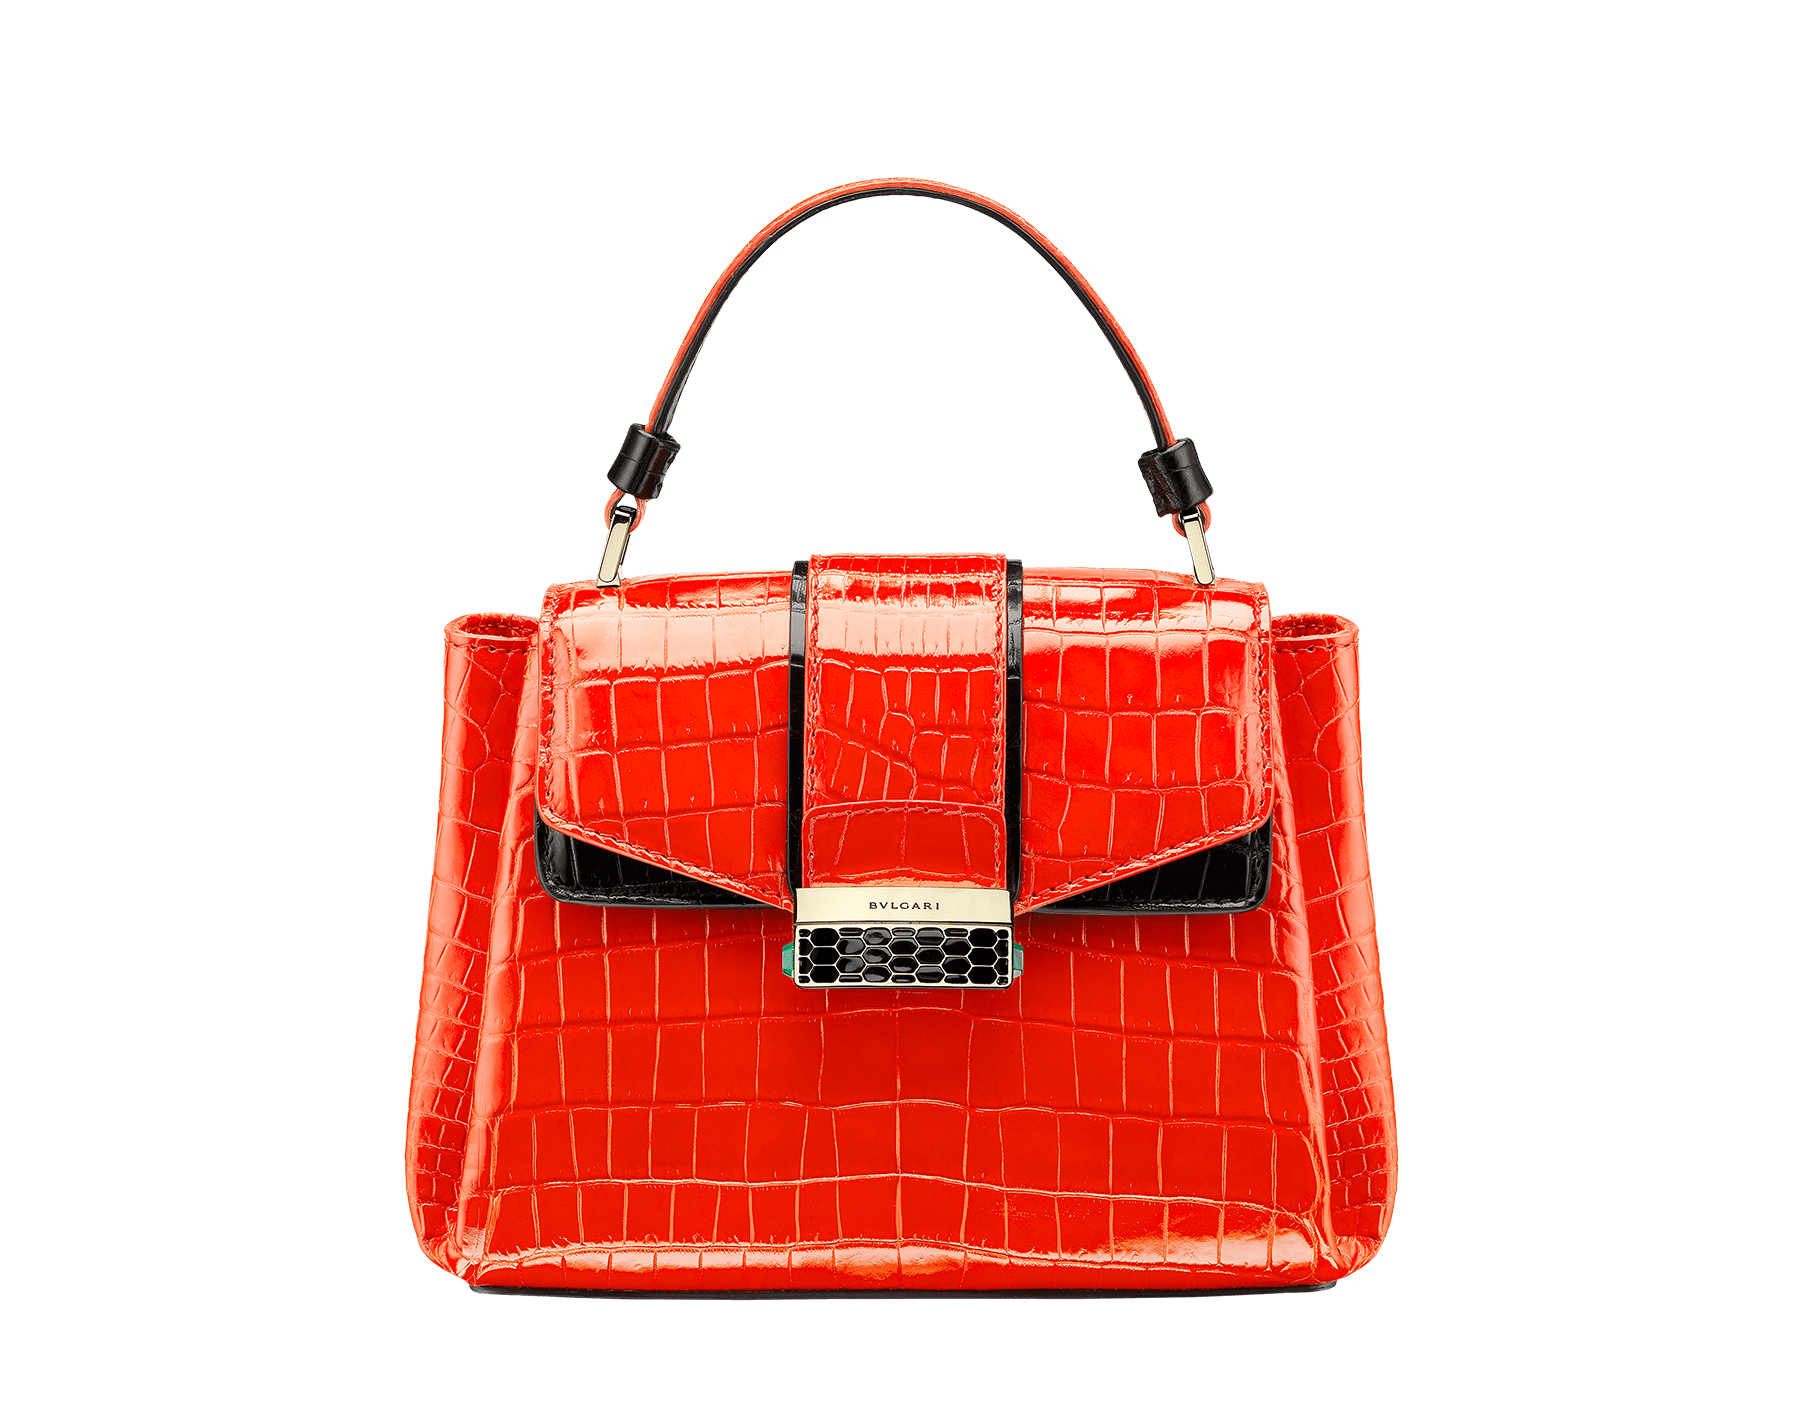 Top handle bag Serpenti Viper in jasper flame and black shiny crocodile skin. 282925 image 1